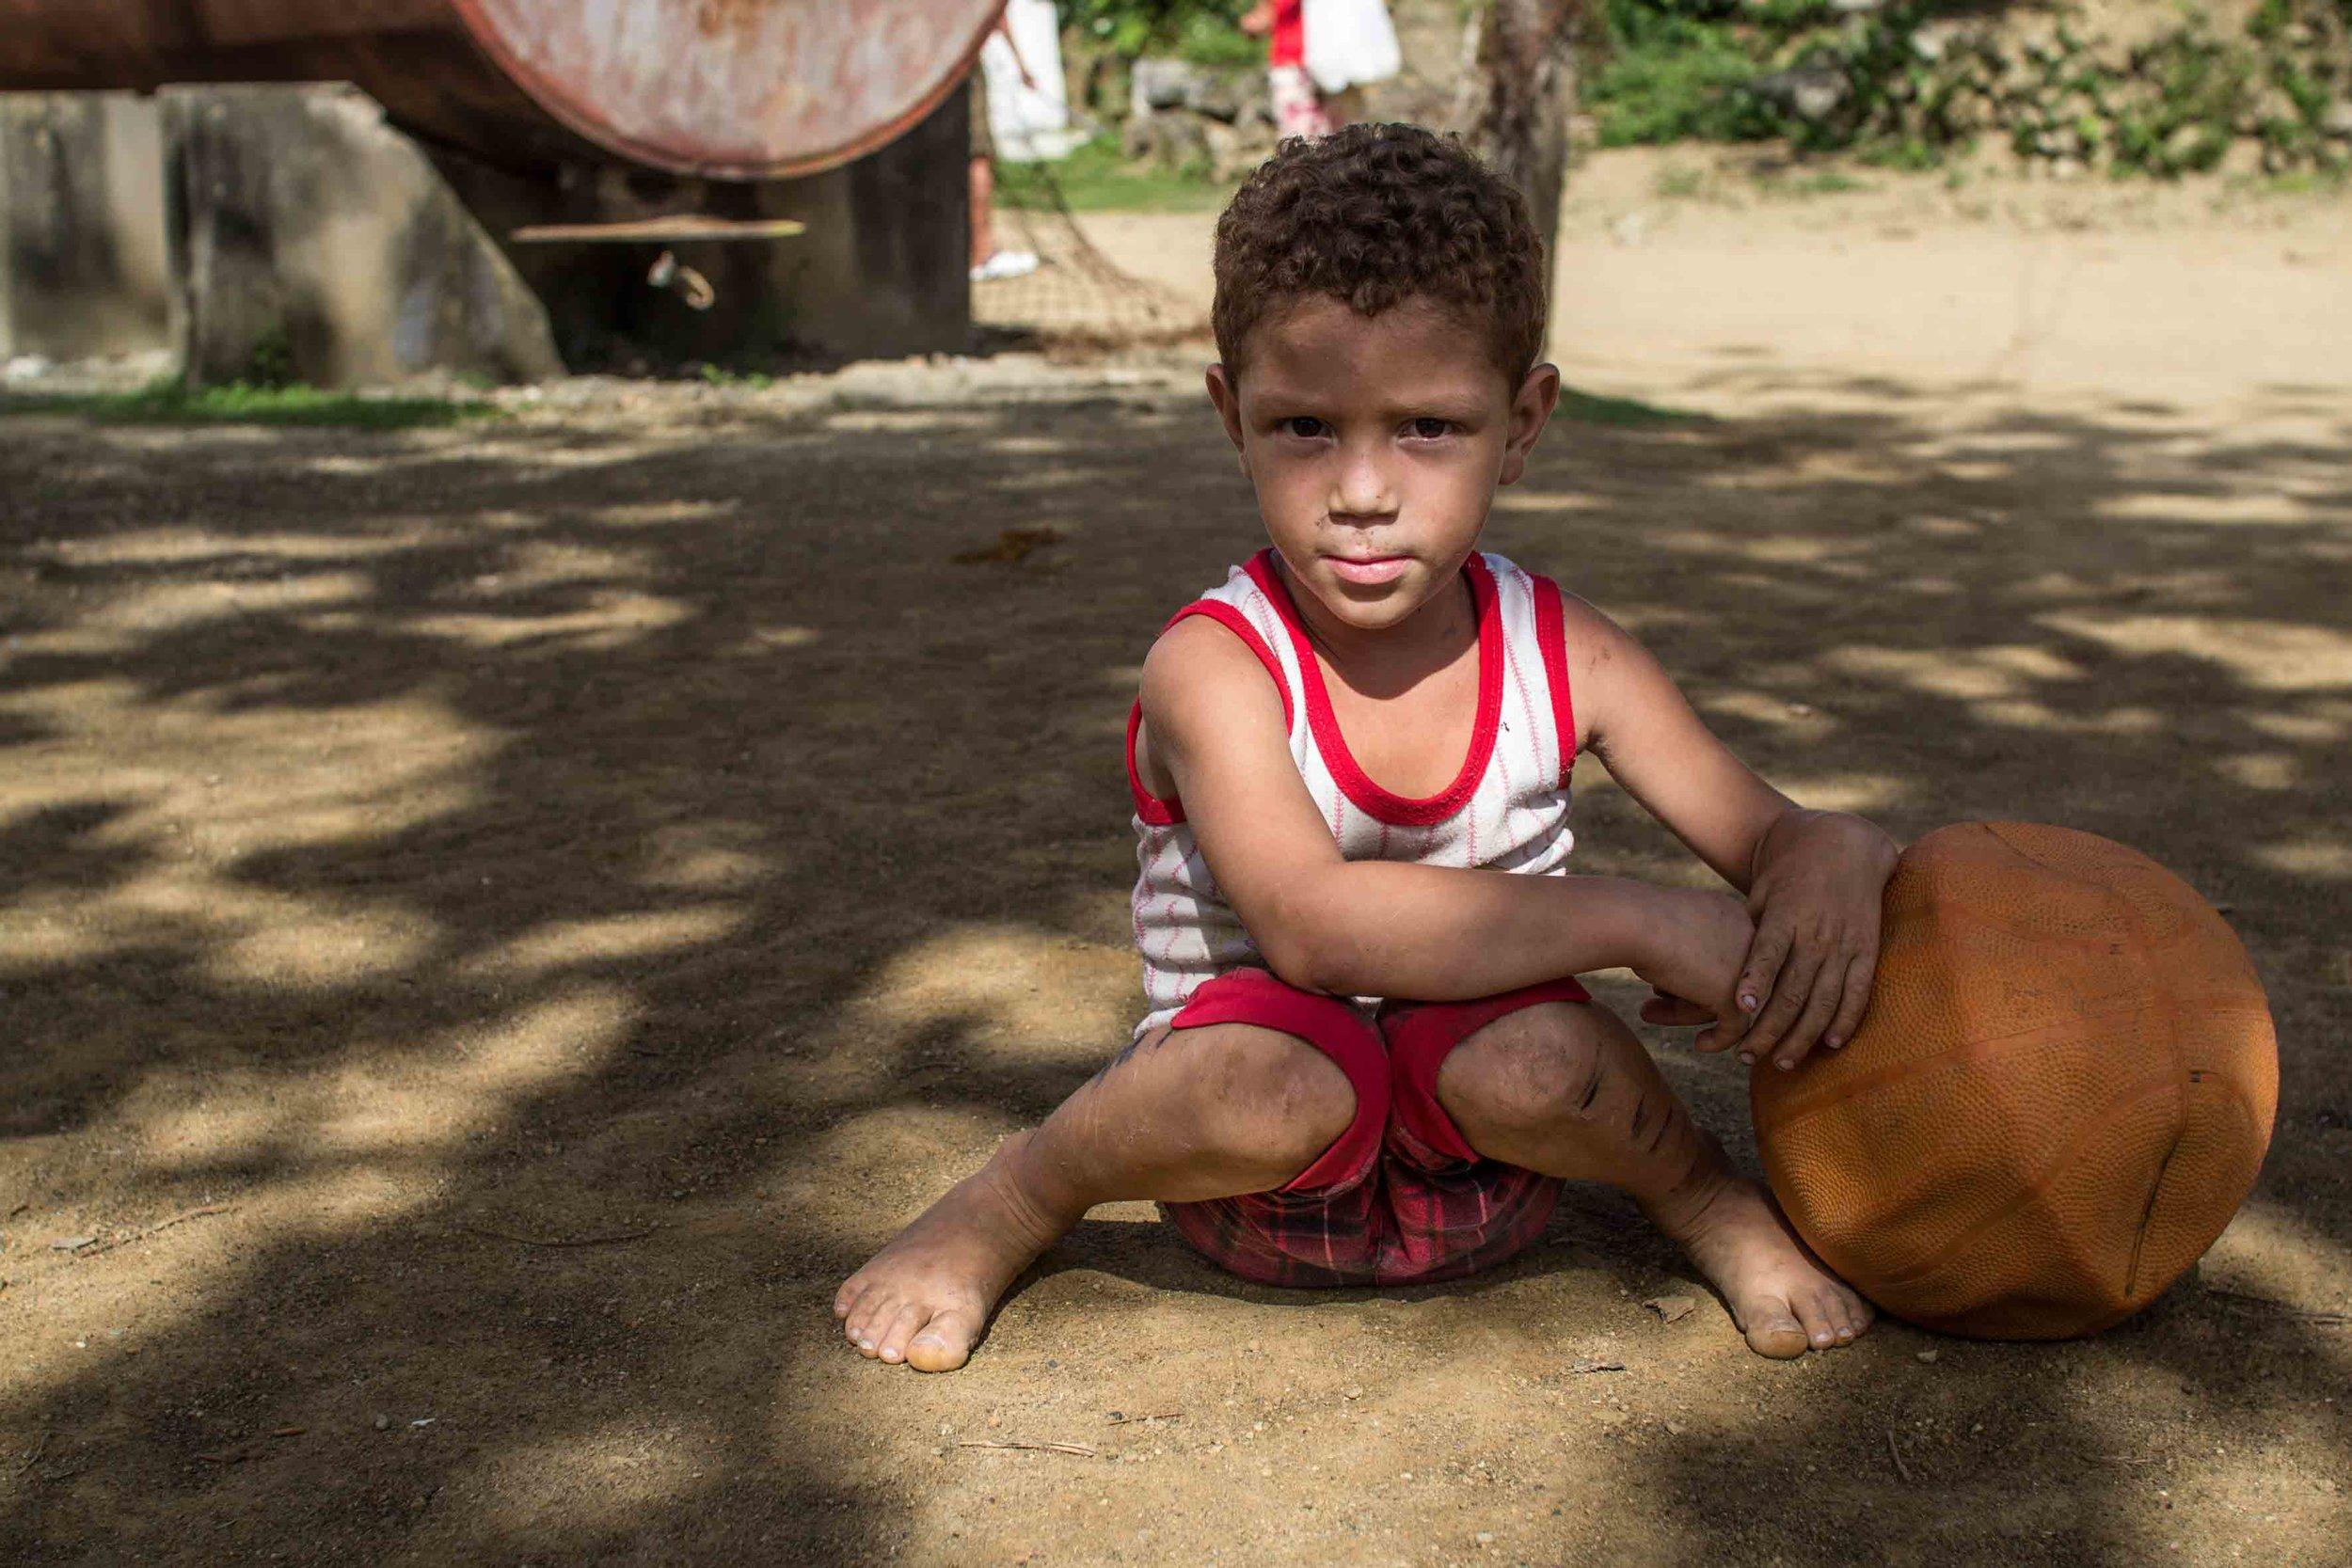 Cuban boy with a ball